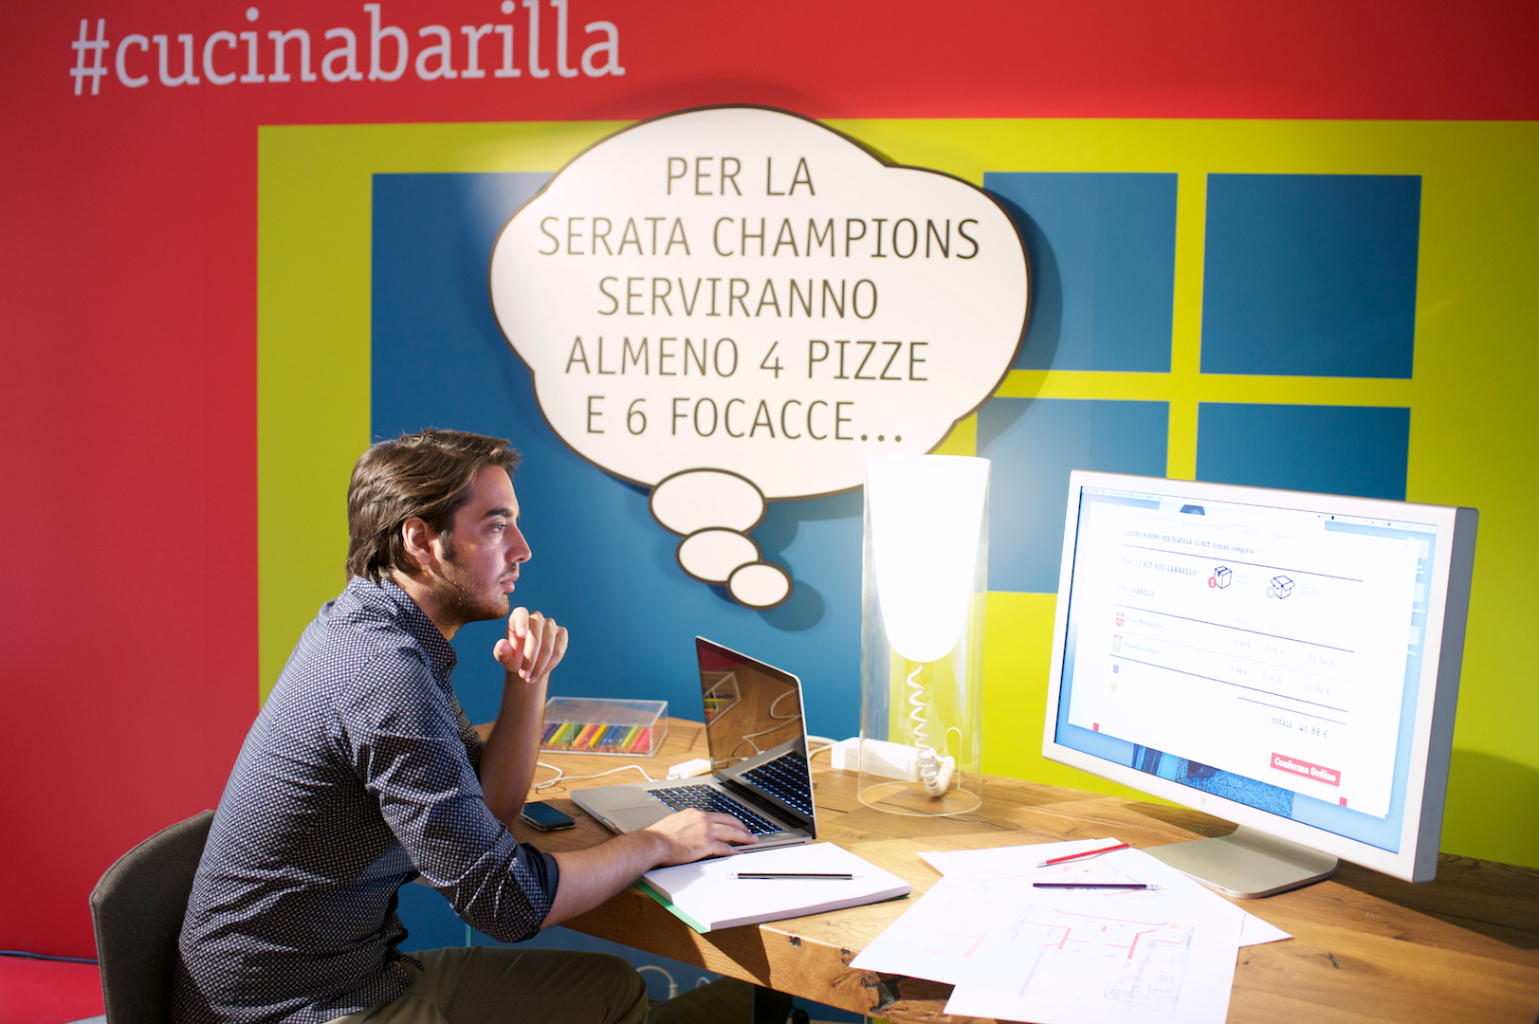 casabarilla (21)